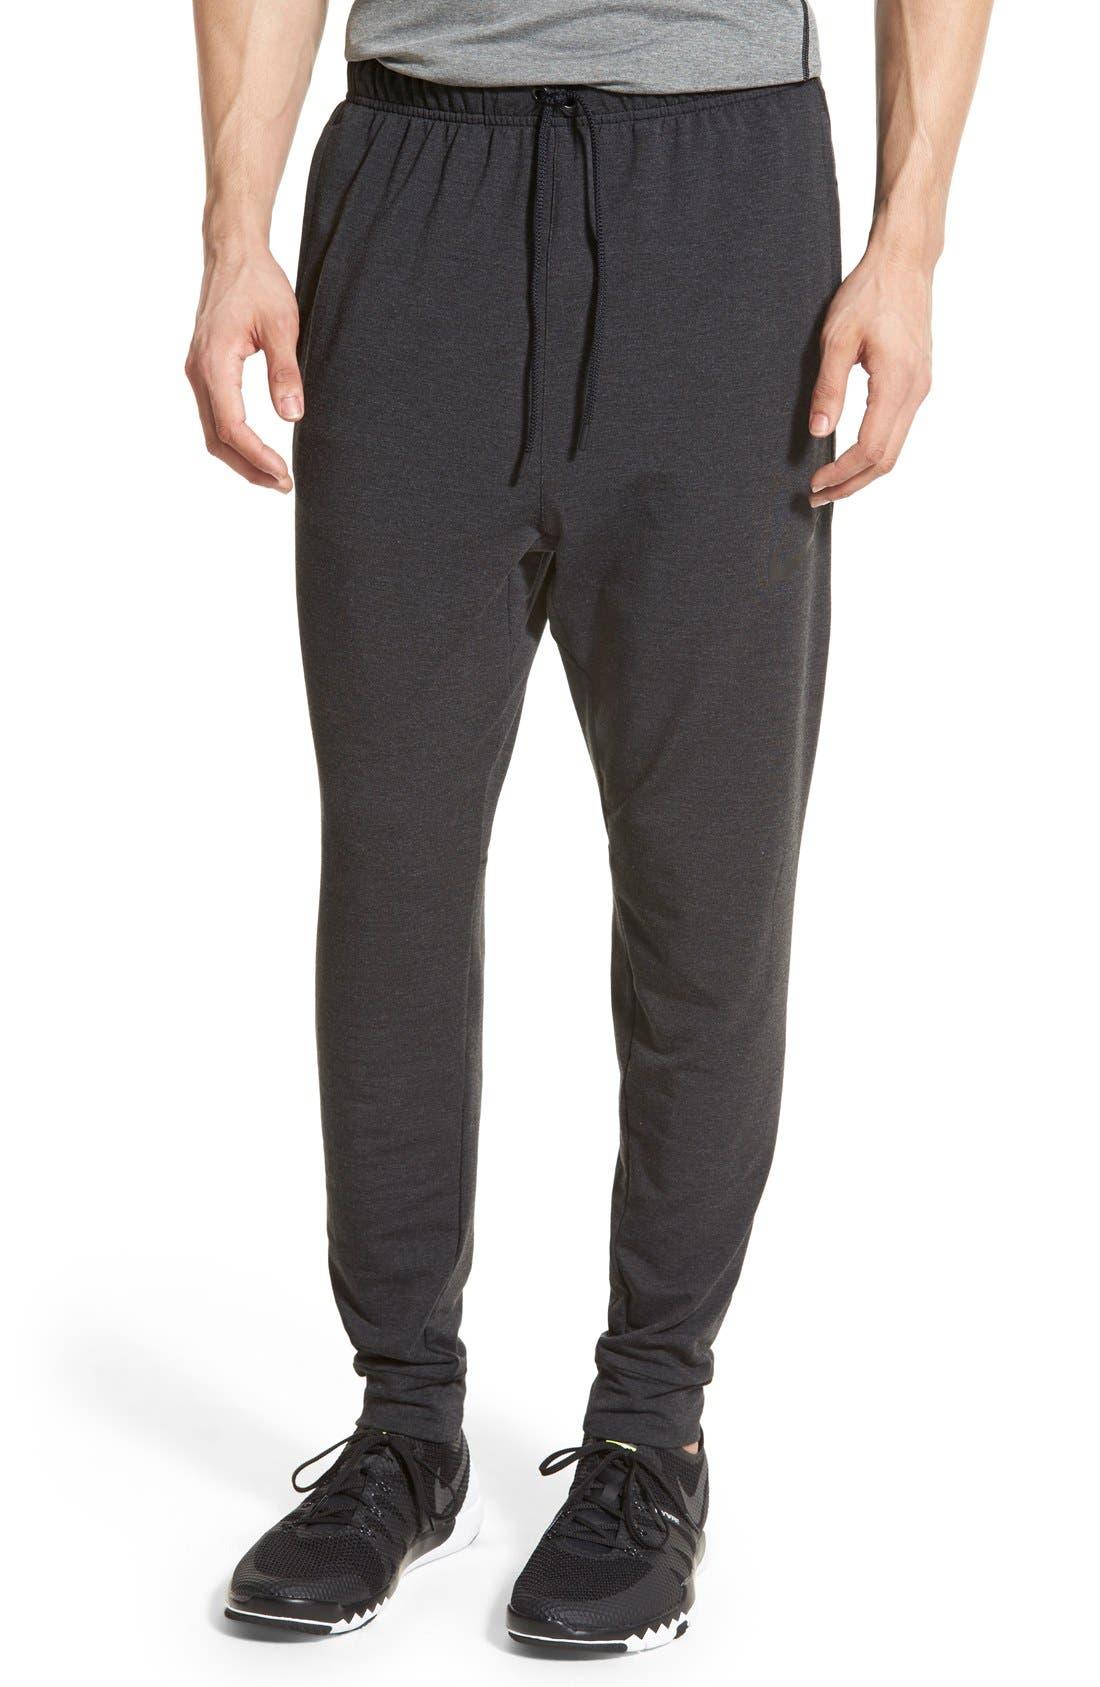 Alternate Image 1 Selected - Nike Dri-FIT Fleece Training Pants